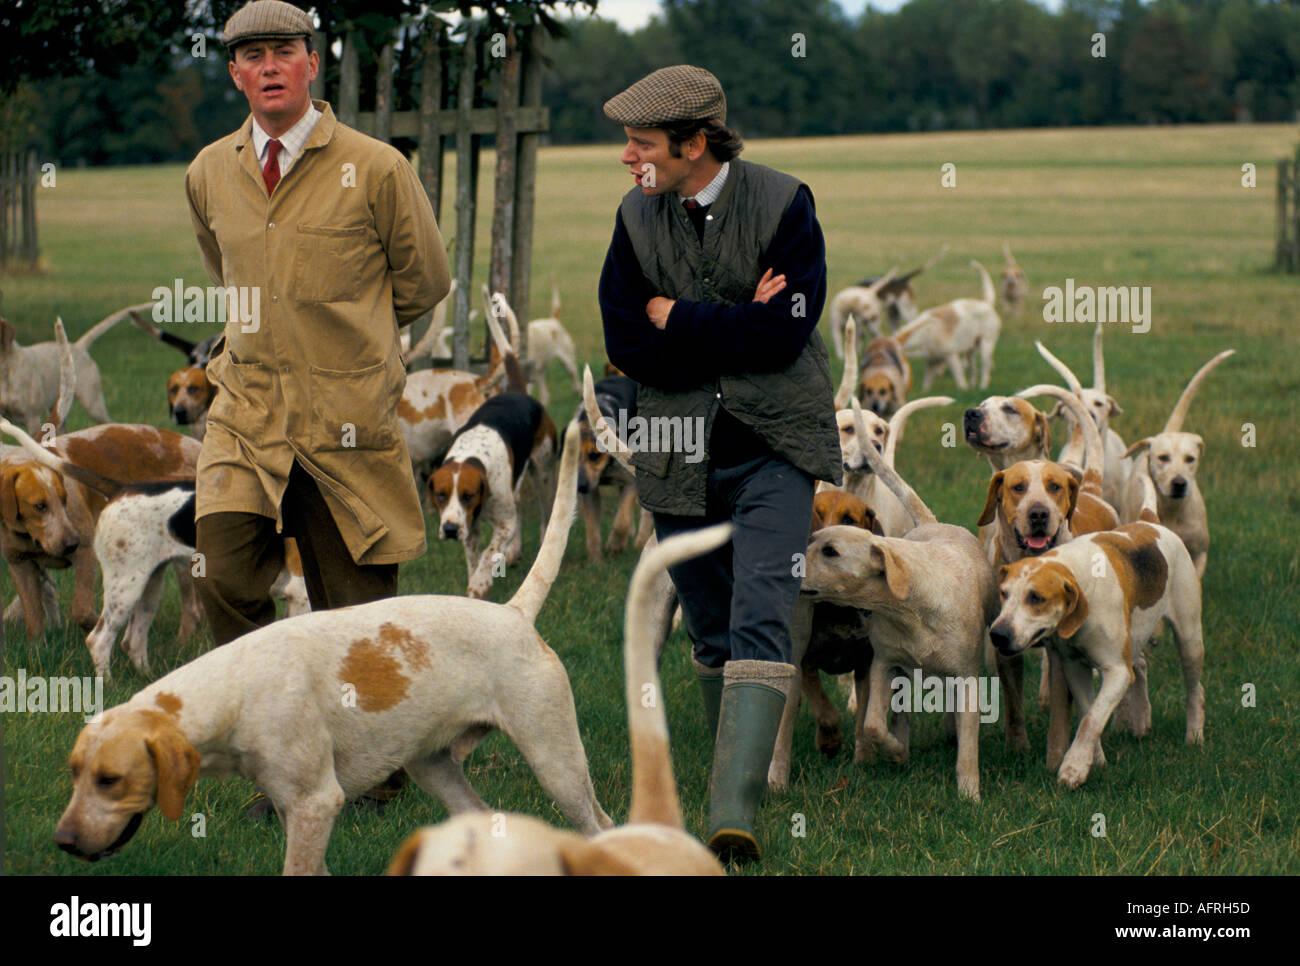 Herzog von Beaufort Jagd Gloucestershire. Zuordnung Telegraph Magazine circa 1995 HOMER SYKES Stockbild